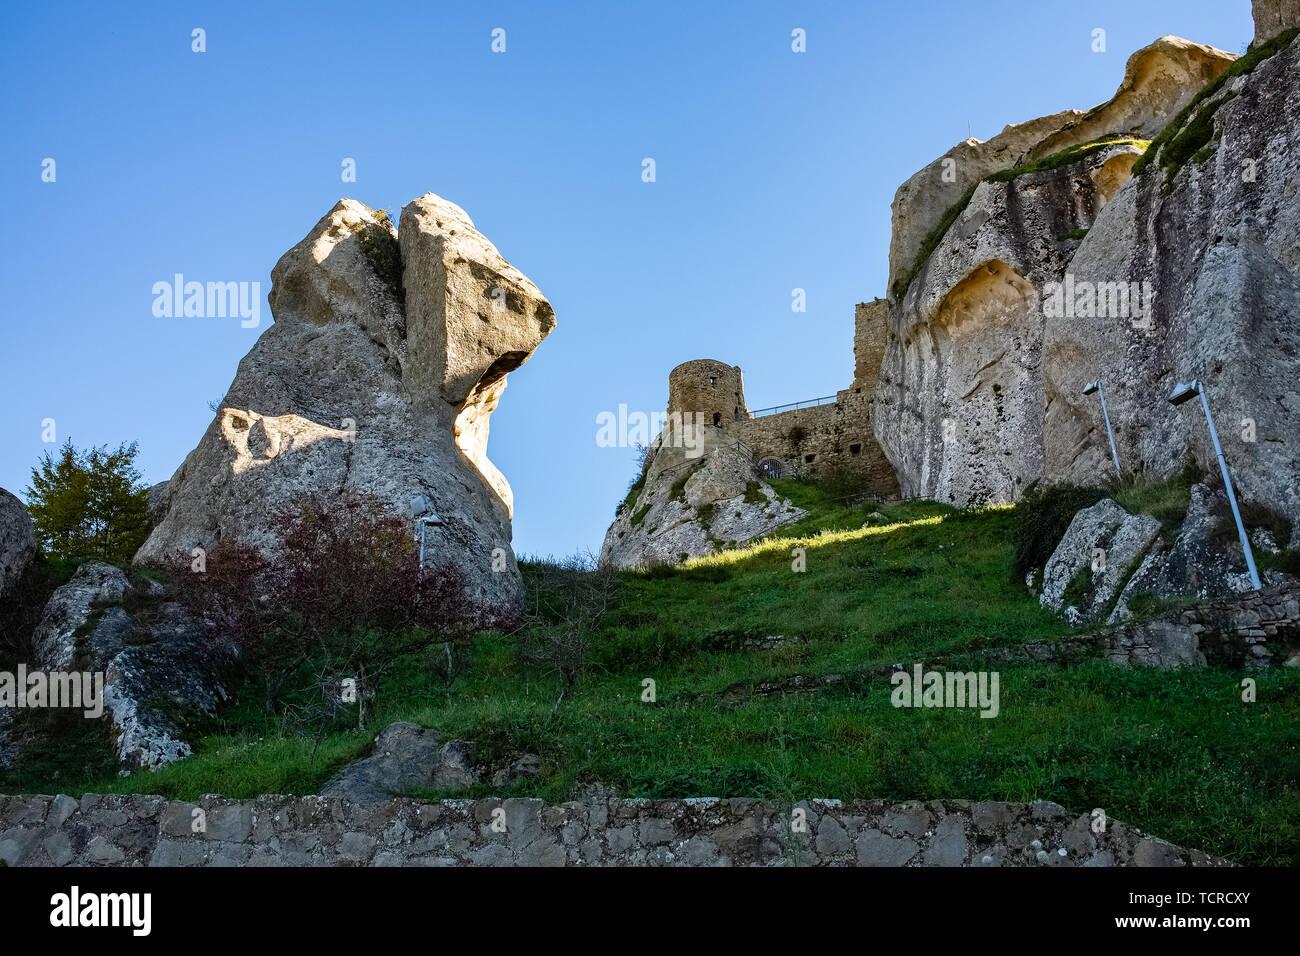 Ruins of Pietrapertosa castle. Dolomites of Basilicata mountains called Dolomiti Lucane. Basilicata region, Italy - Stock Image